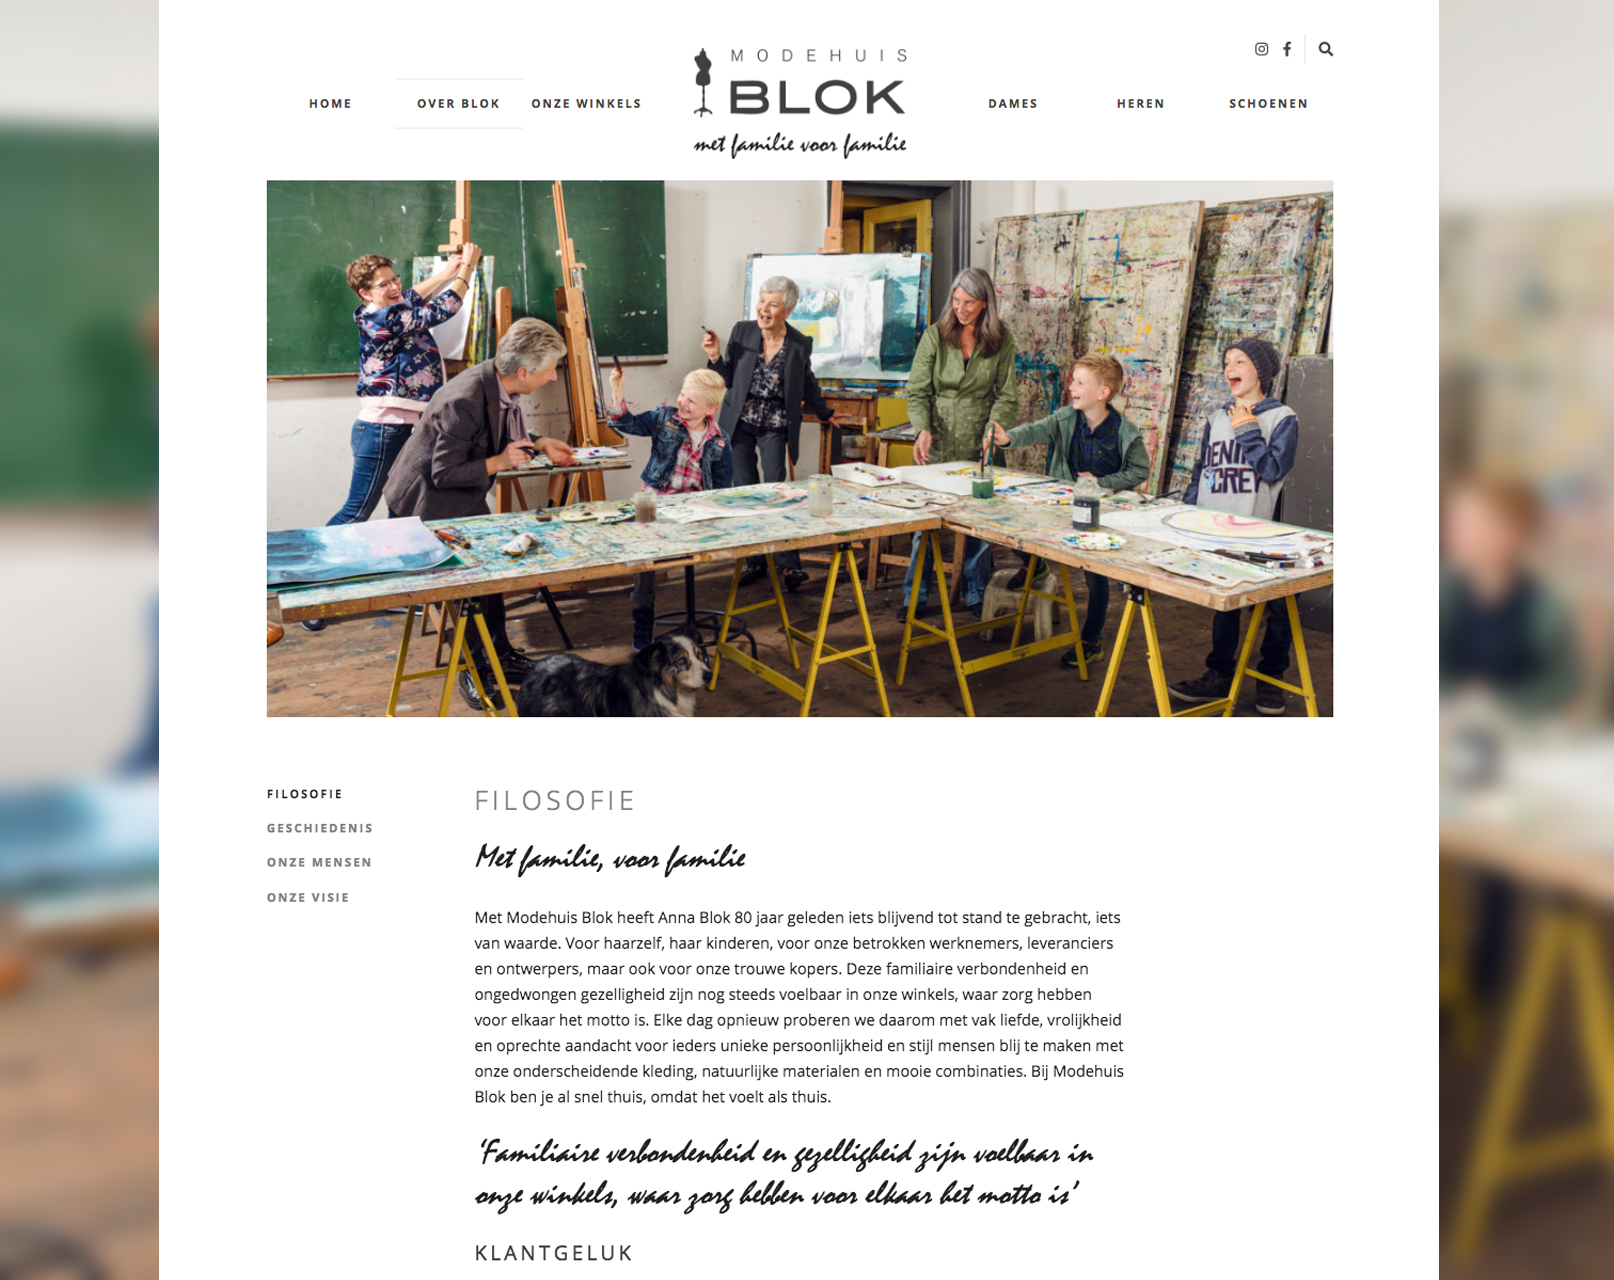 modehuisblok_philosophie_large